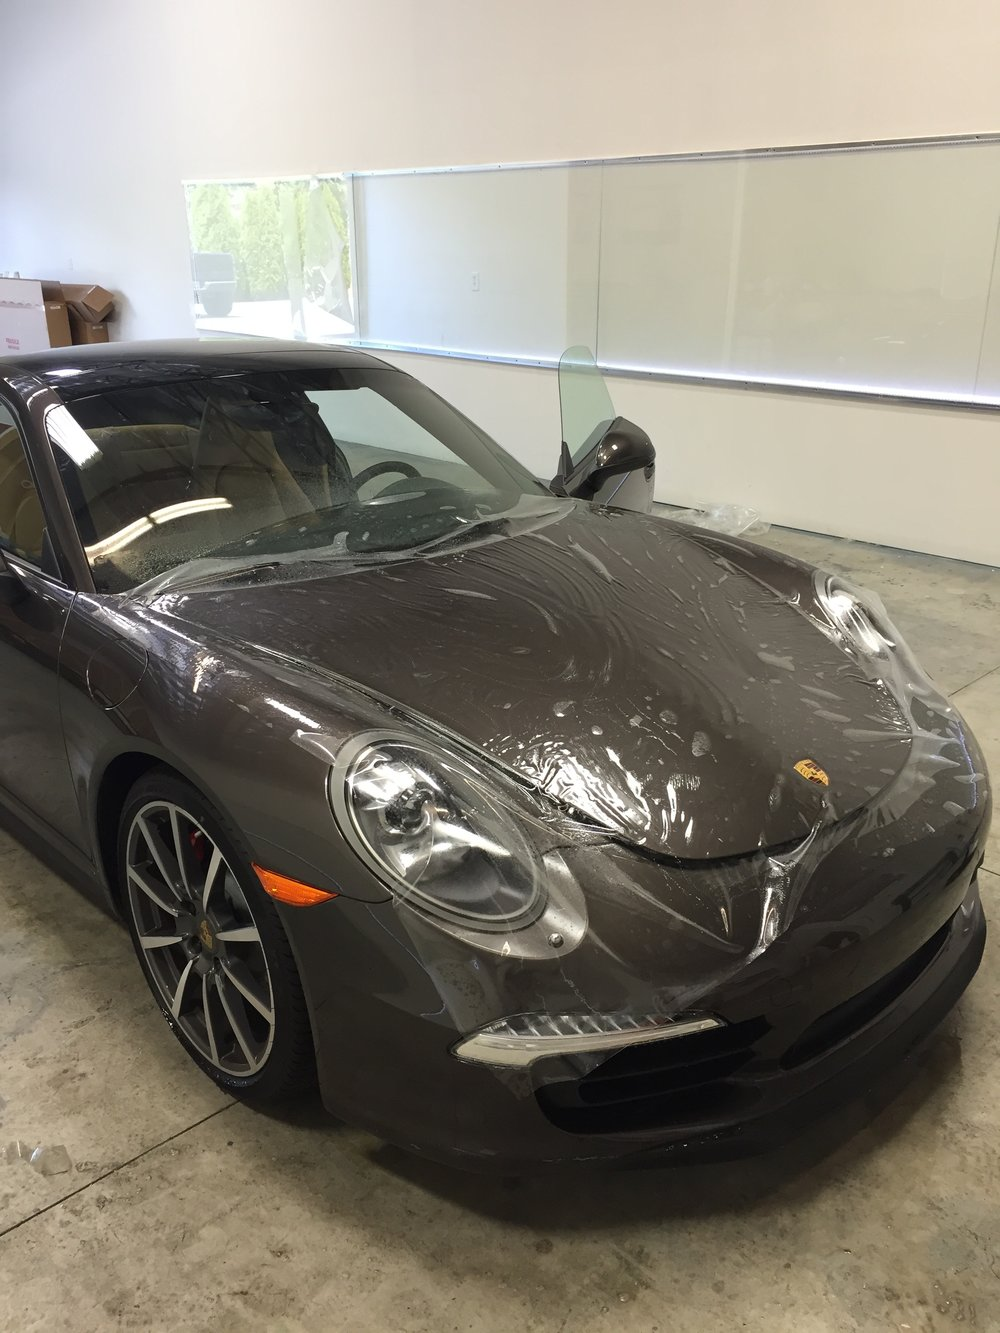 Window-Tint Reno-Porsche-Clearbra.JPG